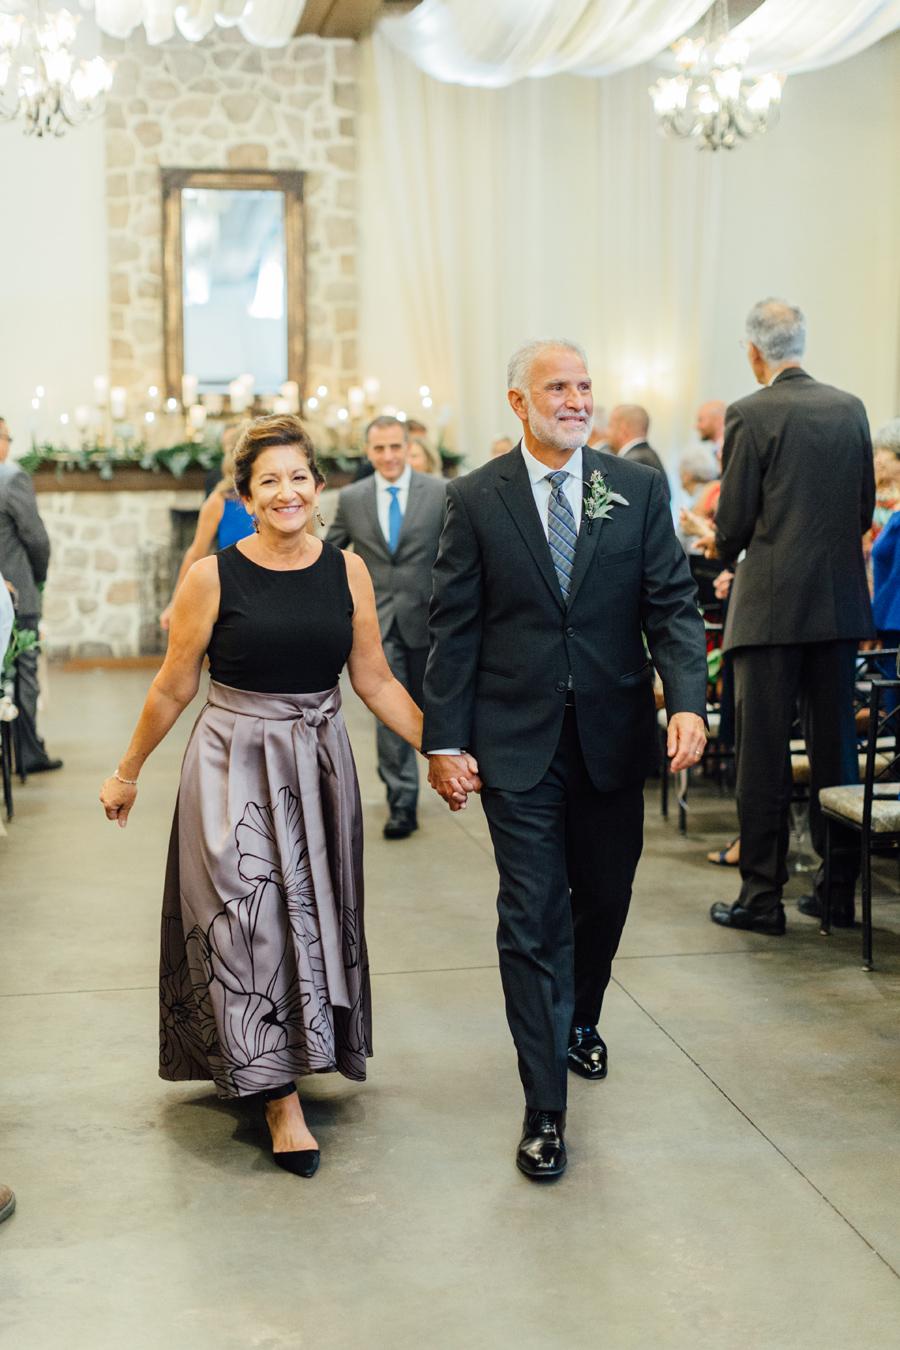 the-inn-at-leola-wedding-lancaster-pennsylvania-wedding-photographer-rebeka-viola-photograhy (64).jpg